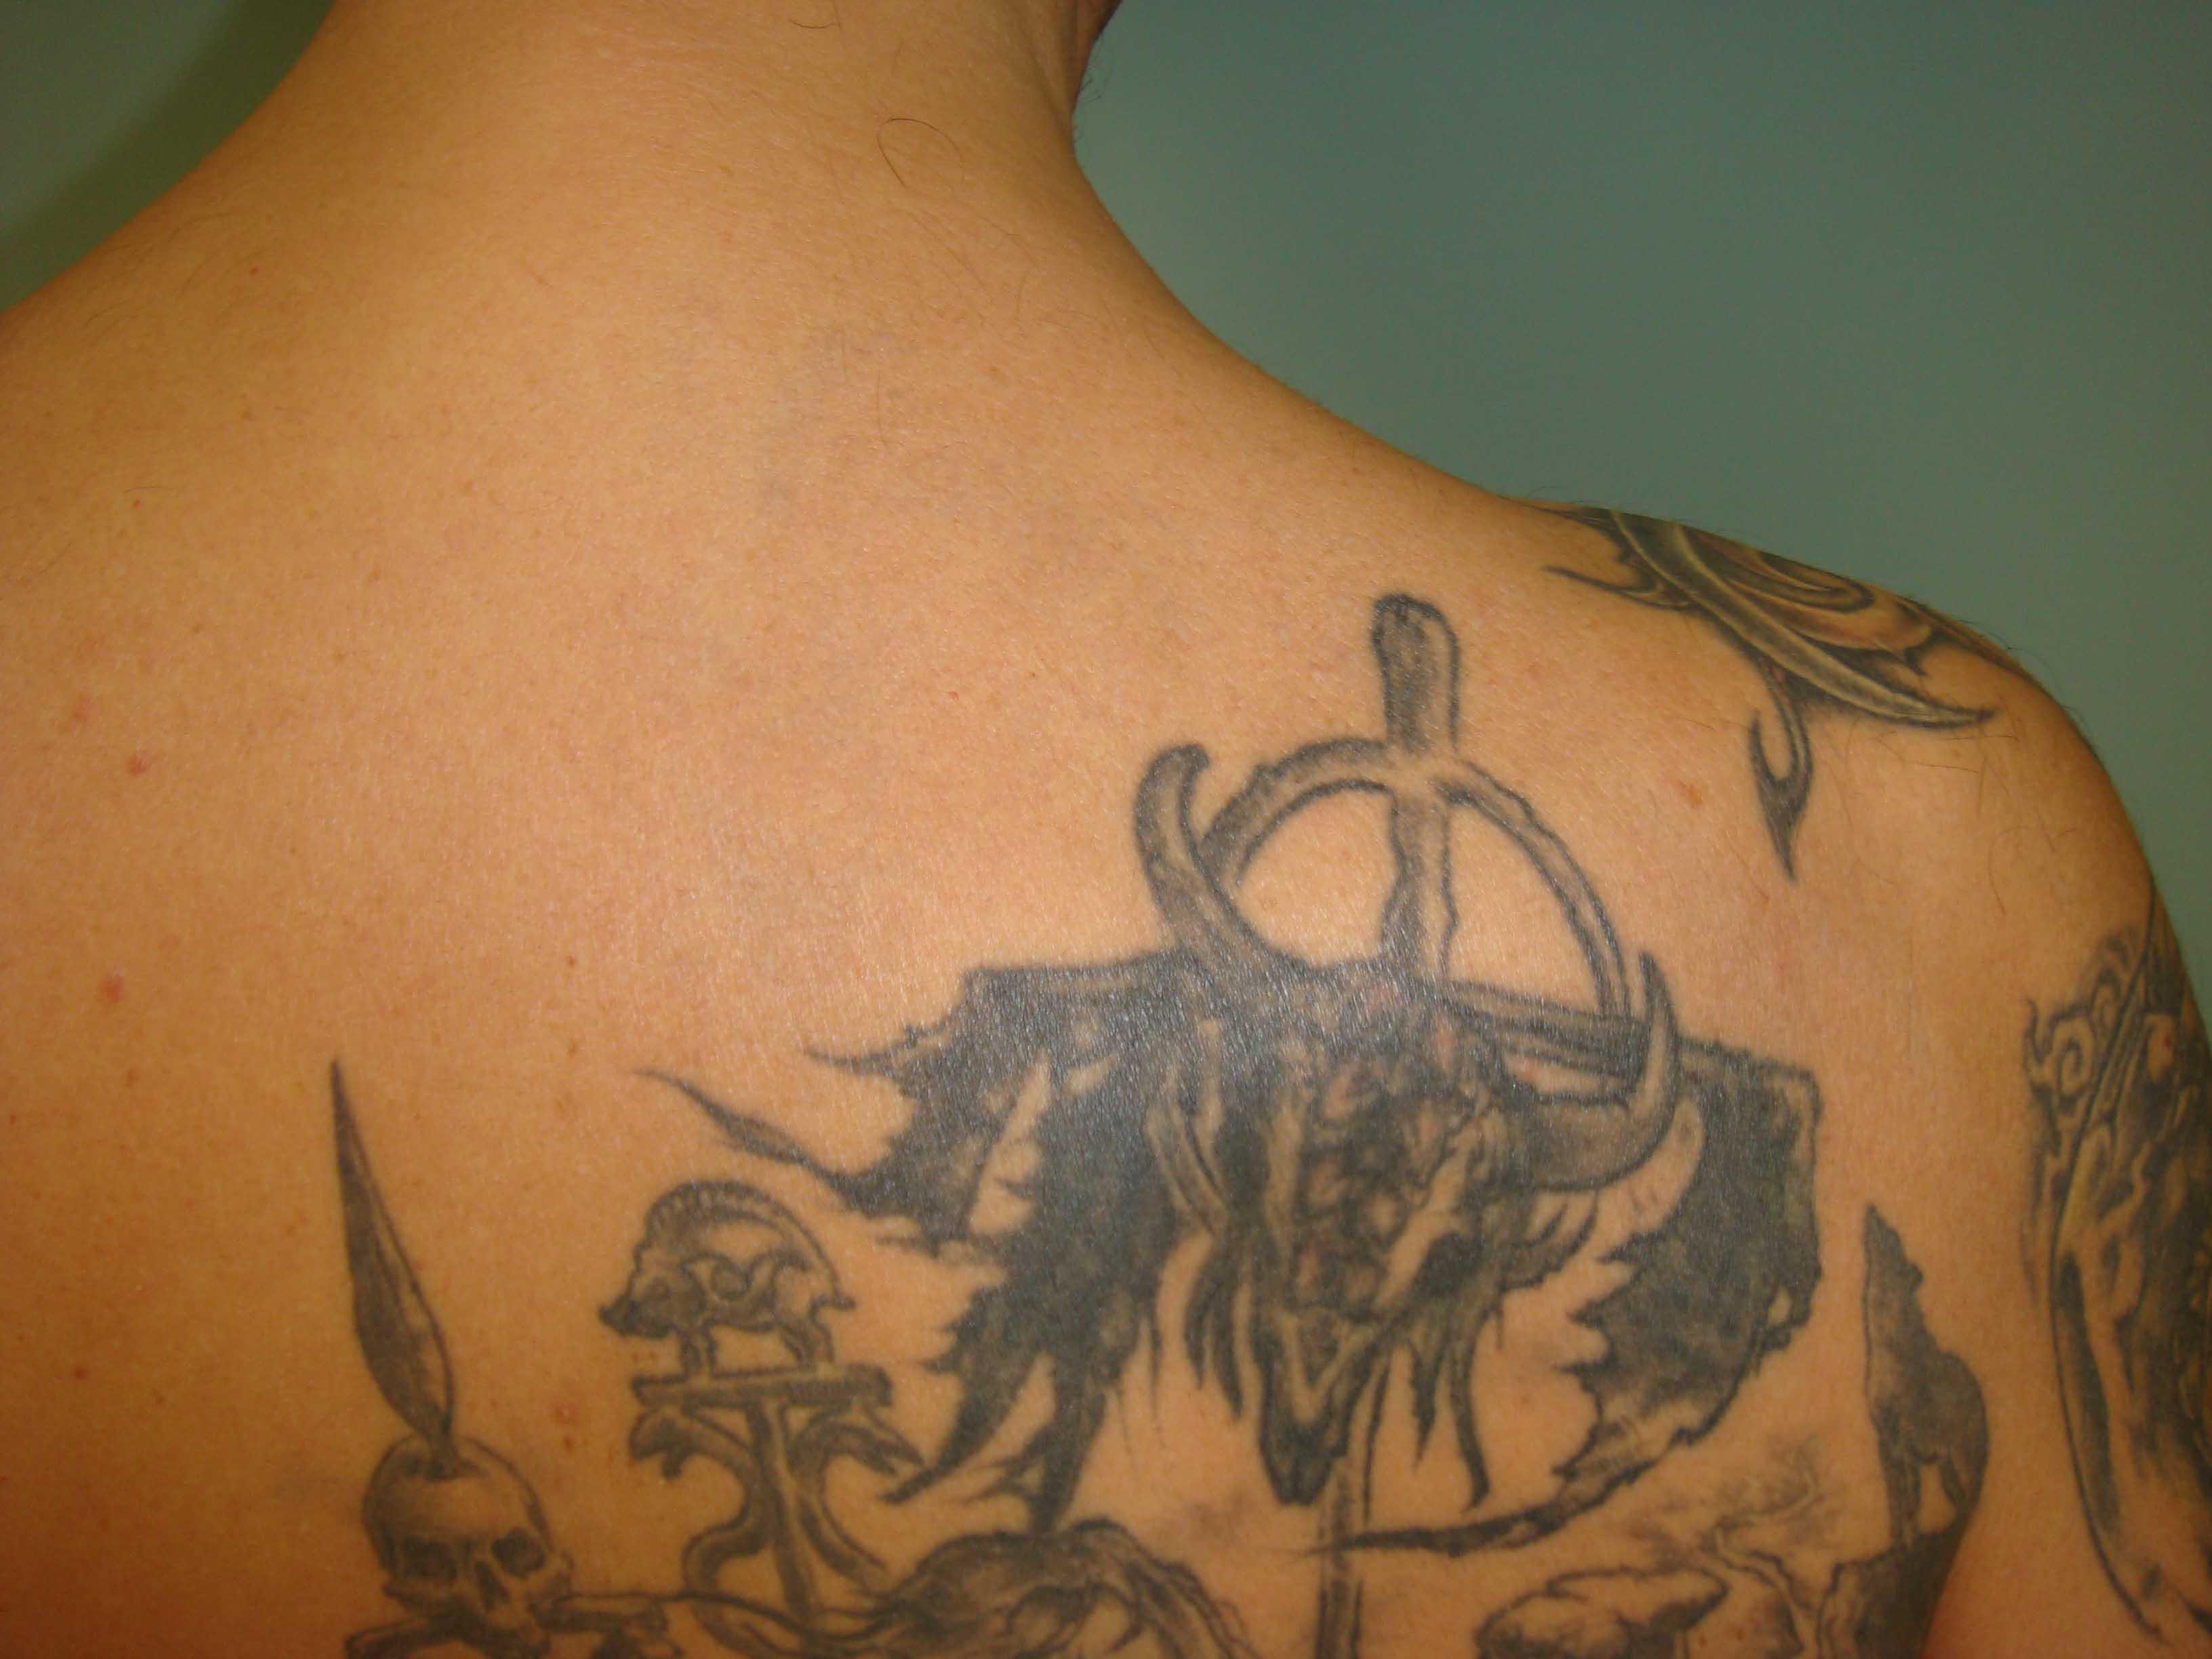 Rimozioni tatuaggi Roma   Dott. Erik Geiger